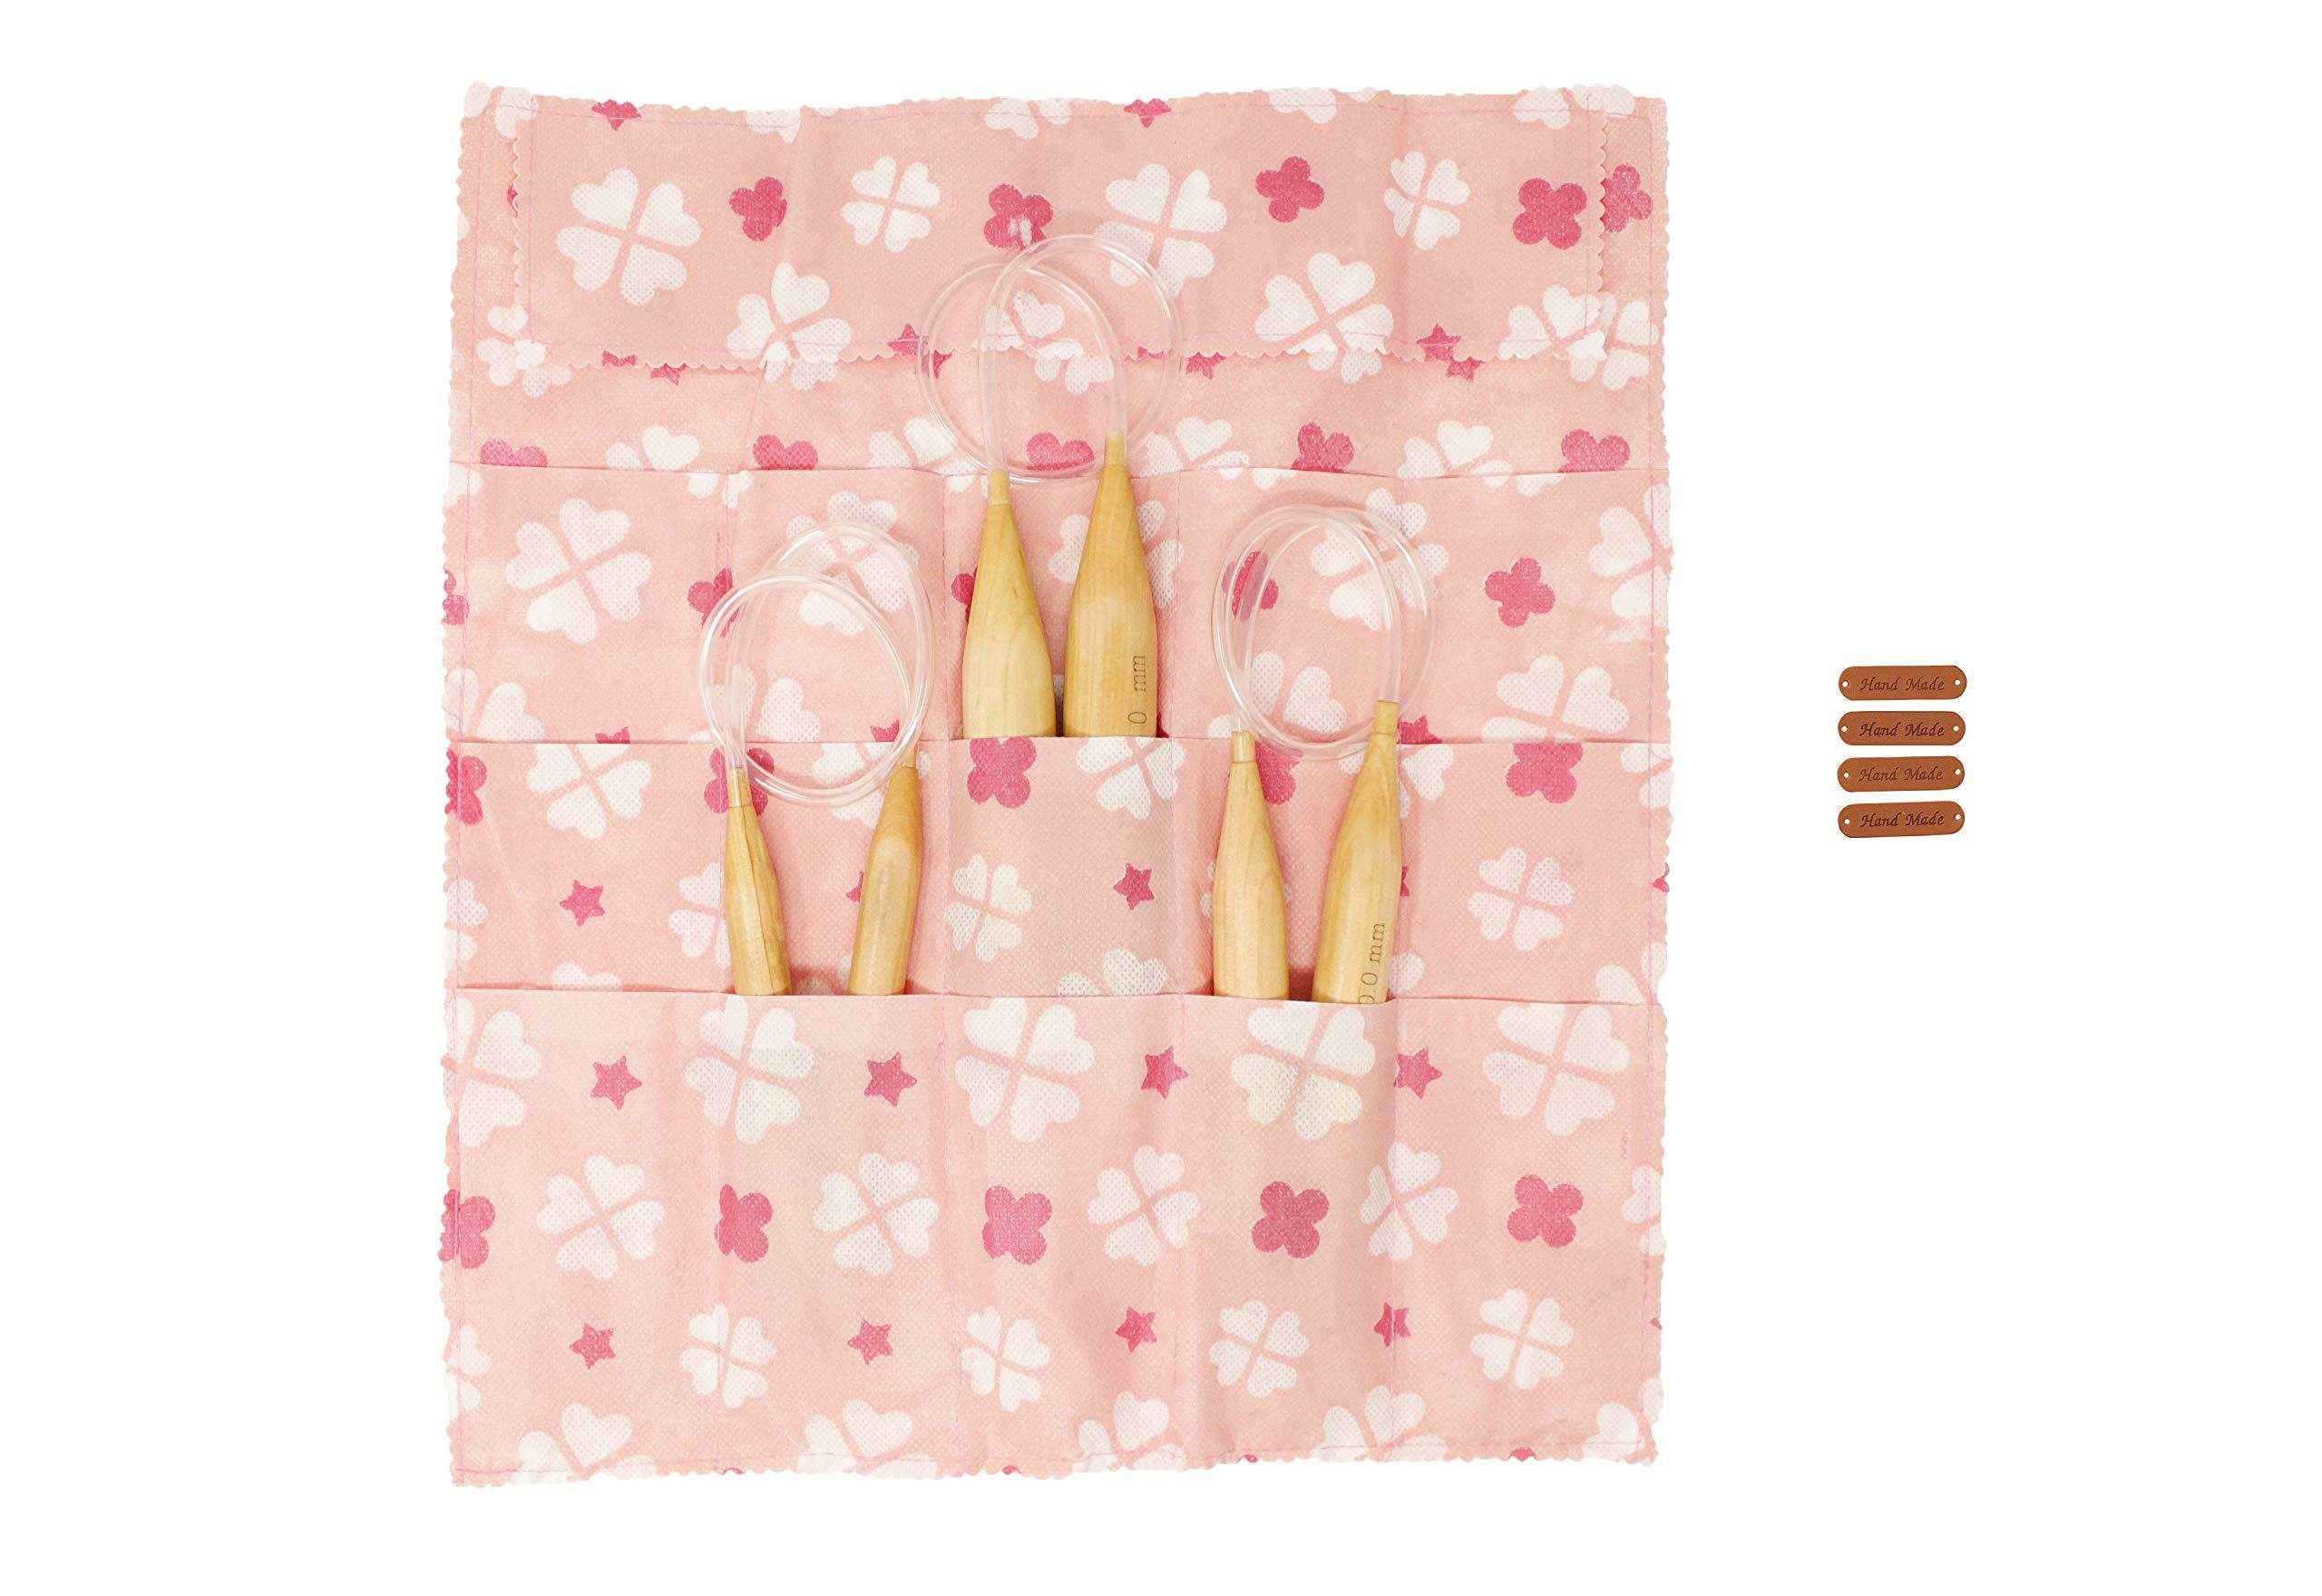 60'' Jumbo Wooden Circular Knitting Needles Set of 3 I Chunky Yarn (US Sizes 19, 35 & 50) with Bonuses   Great Knitters Gift